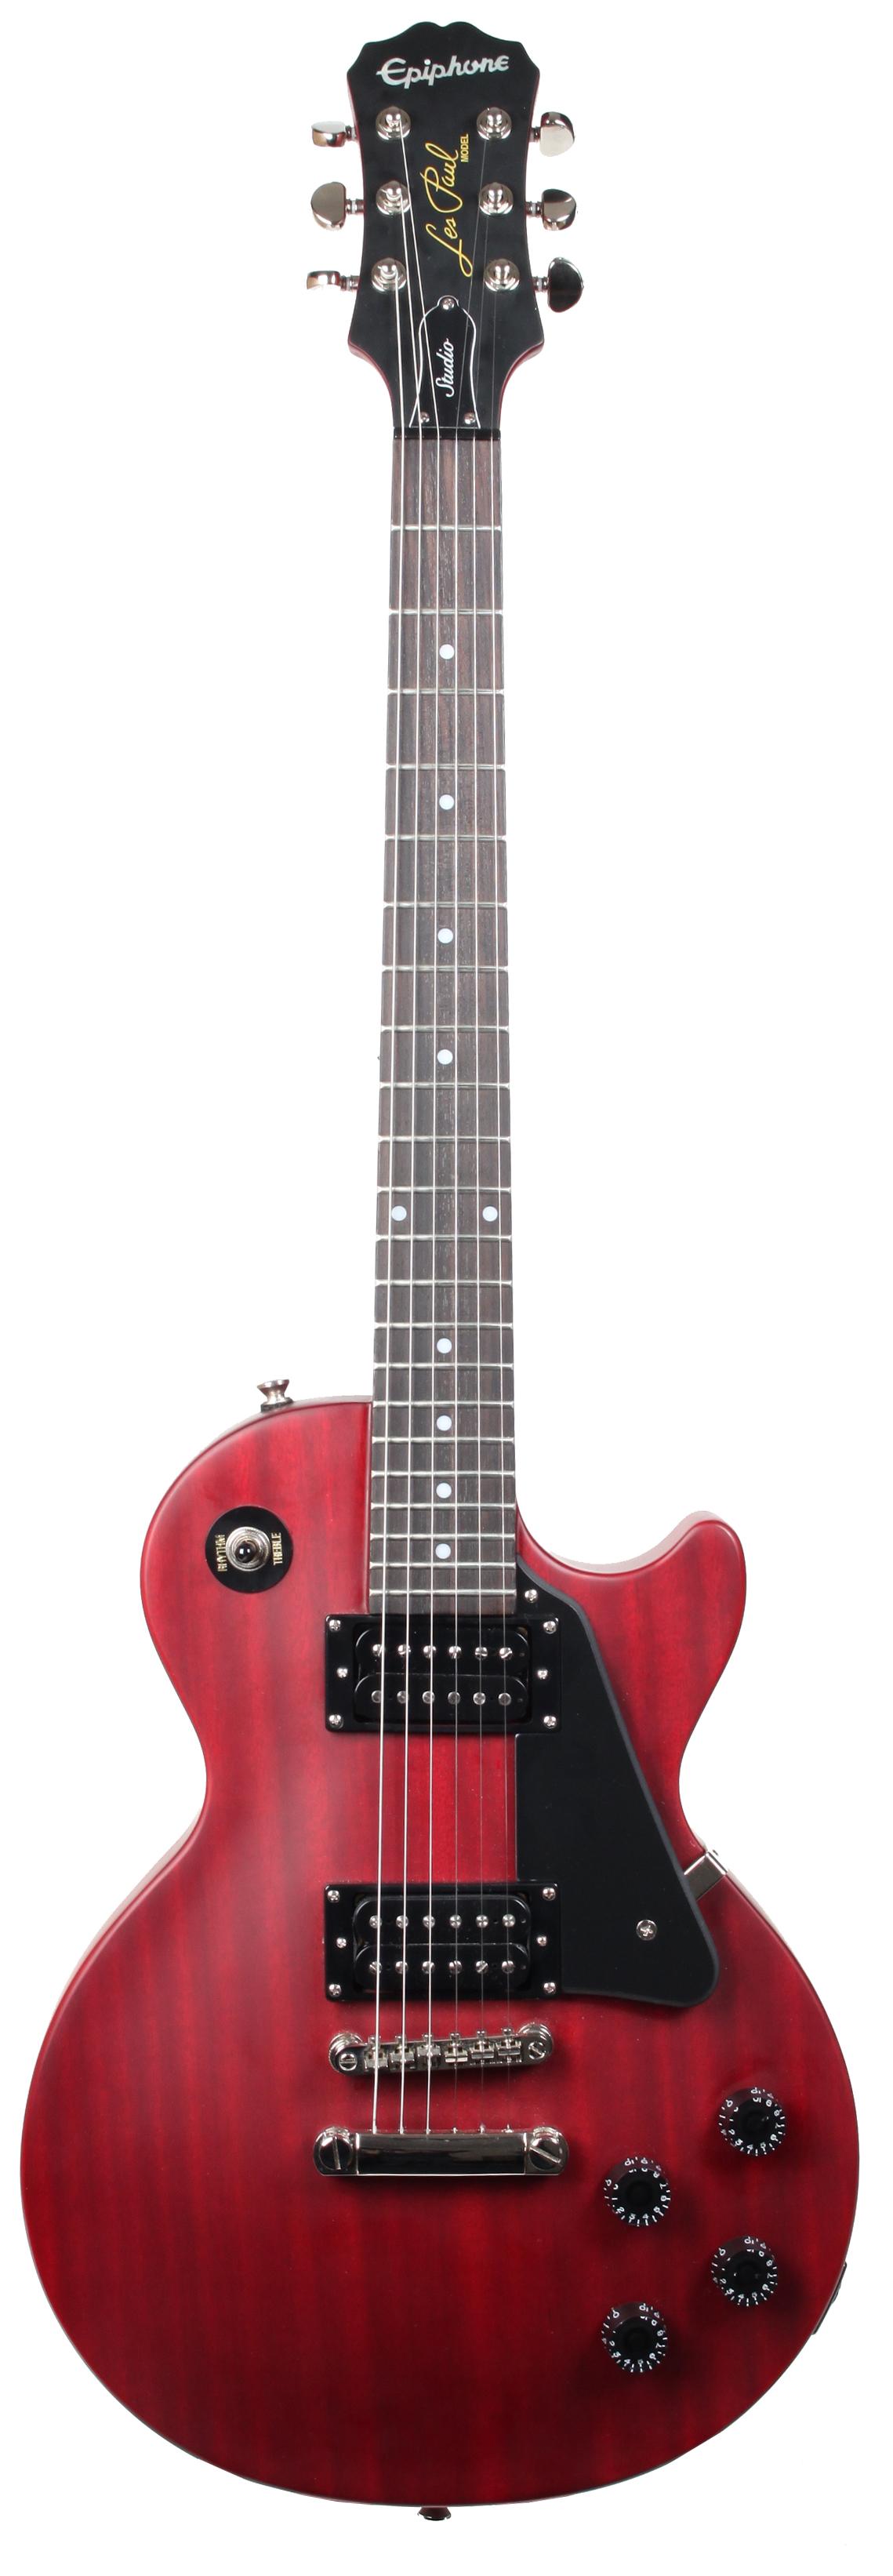 Recently Sold Guitars Amp Basses Mj Guitars